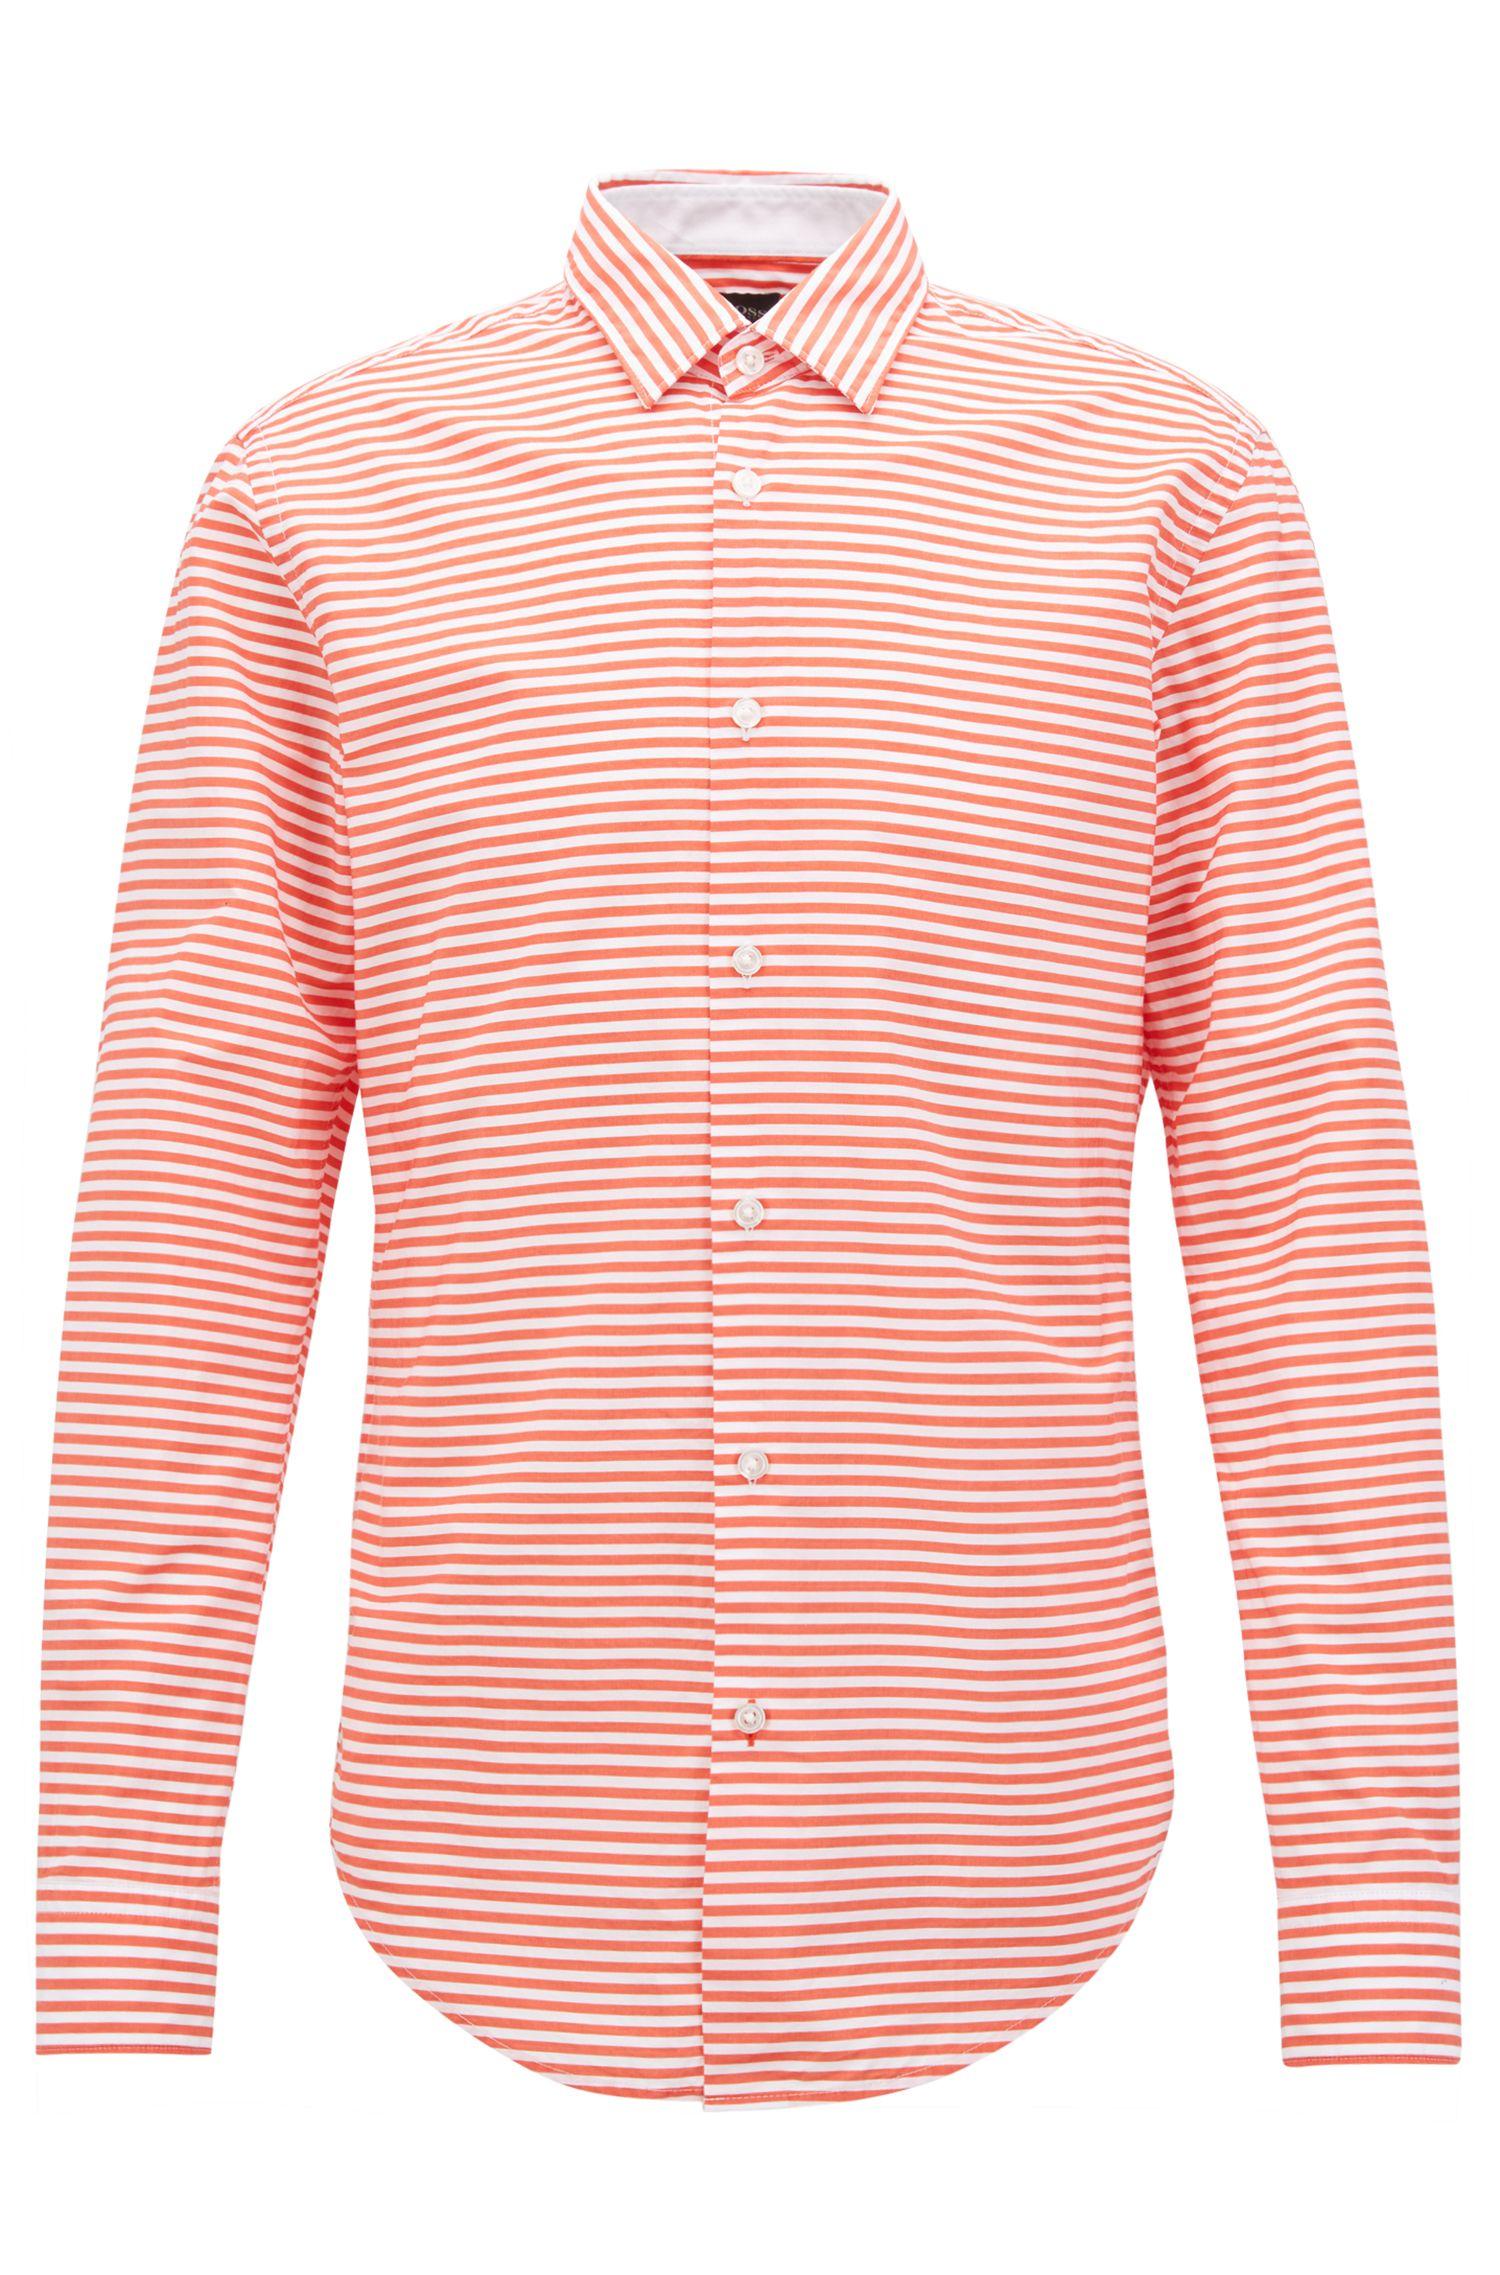 Striped Cotton Sport Shirt, Slim Fit | Ronnie F, Orange